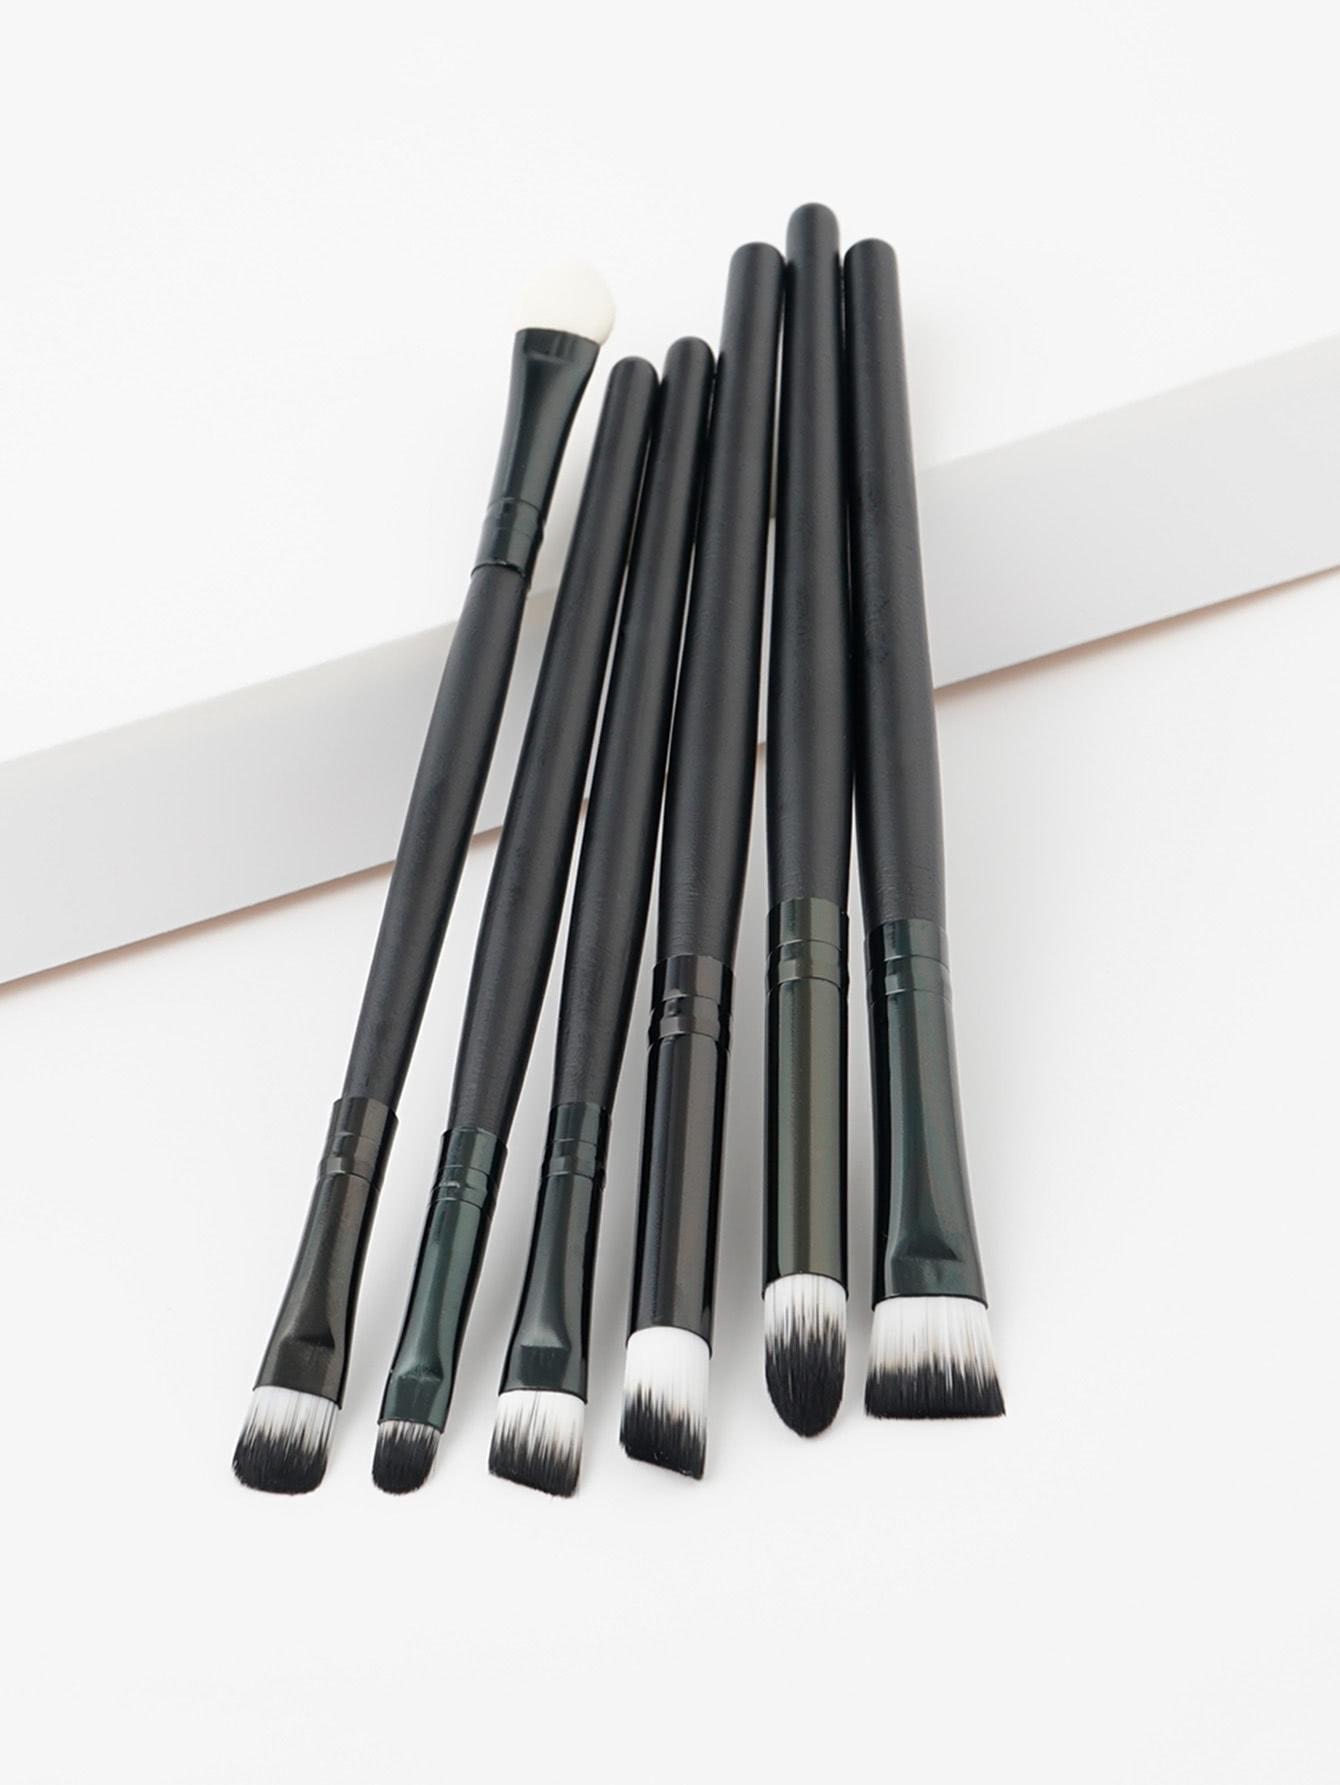 Soft Bristle Eye Brush 6pcs 3 bristle